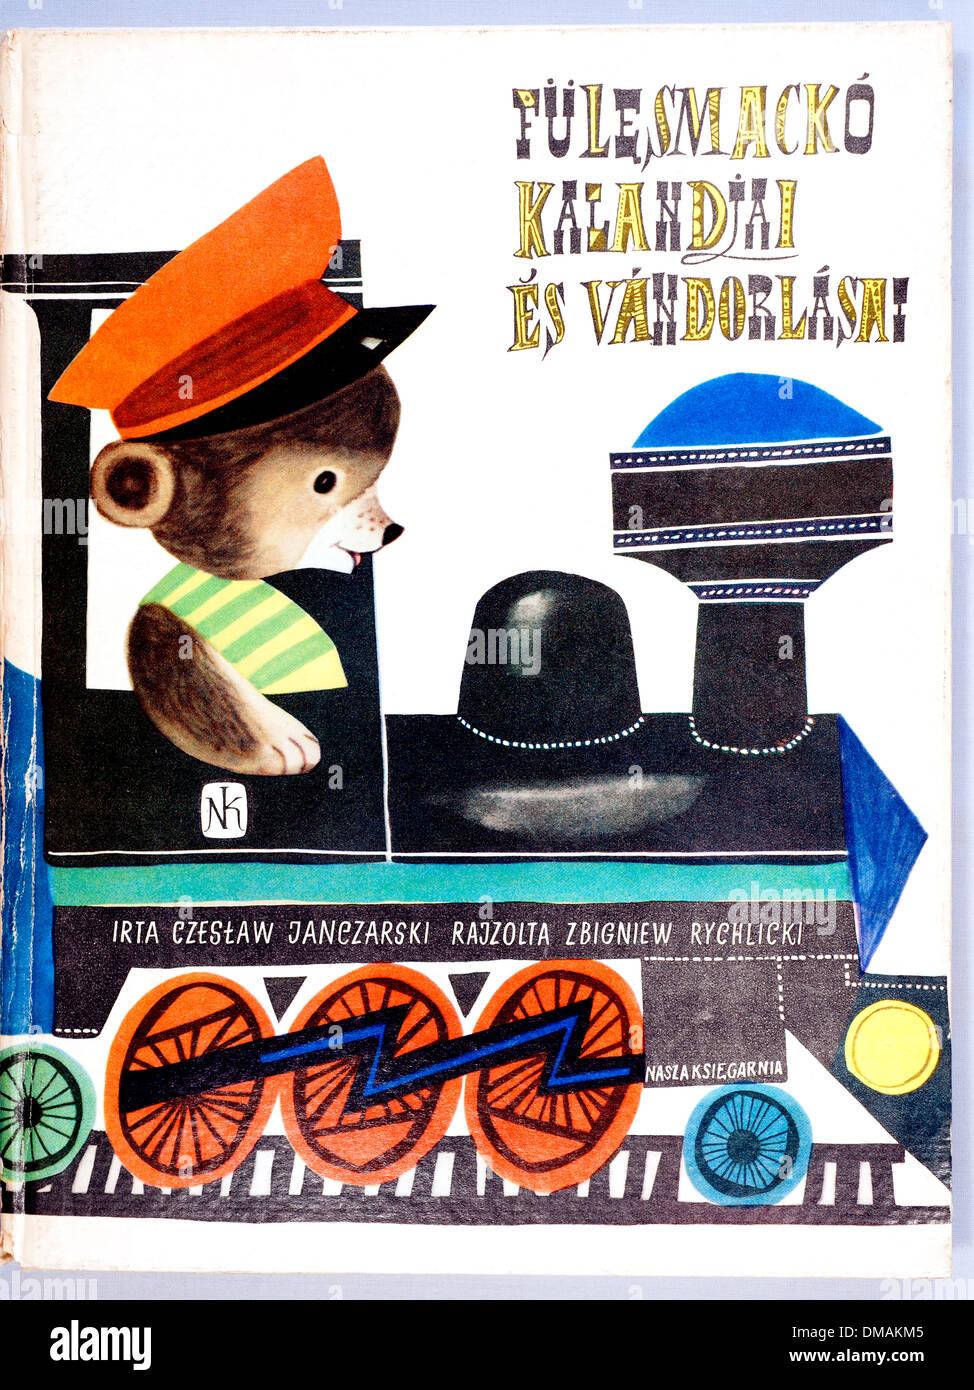 Vintage Old Hungarian Children's Book Illustration Historical Archival Document - Stock Image